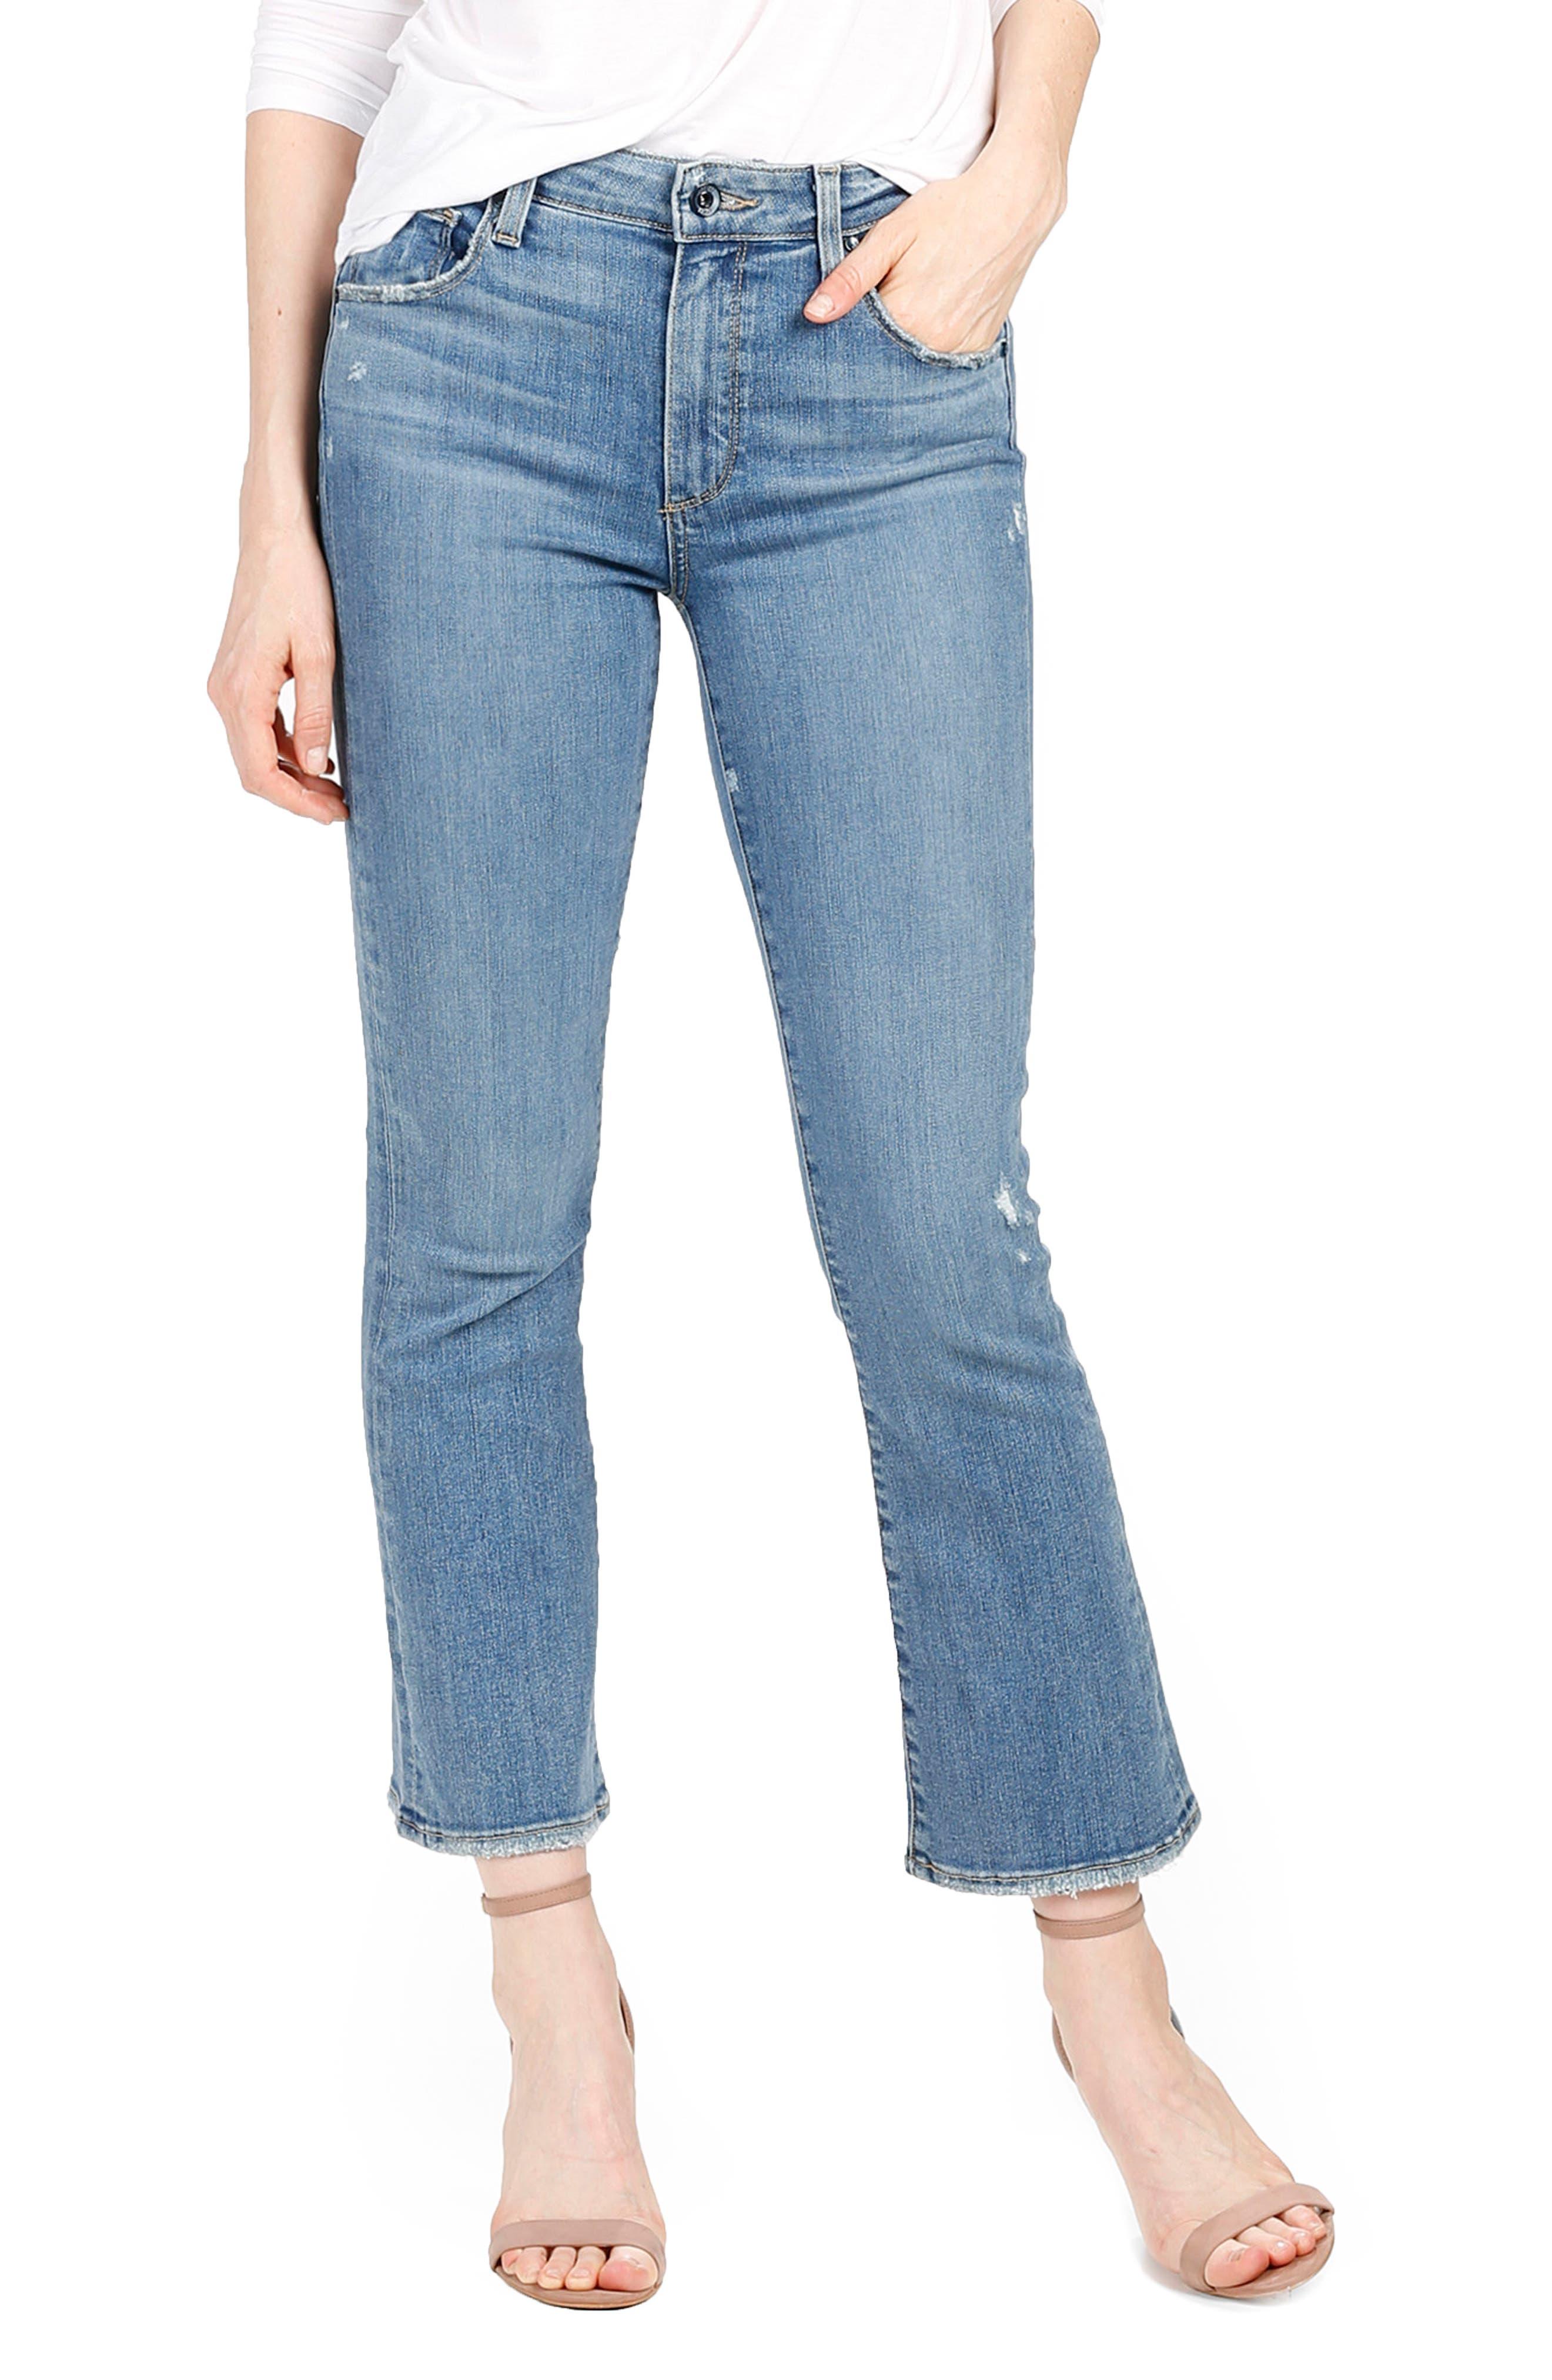 Alternate Image 1 Selected - PAIGE Transcend - Colette High Waist Crop Flare Jeans (Sienna)